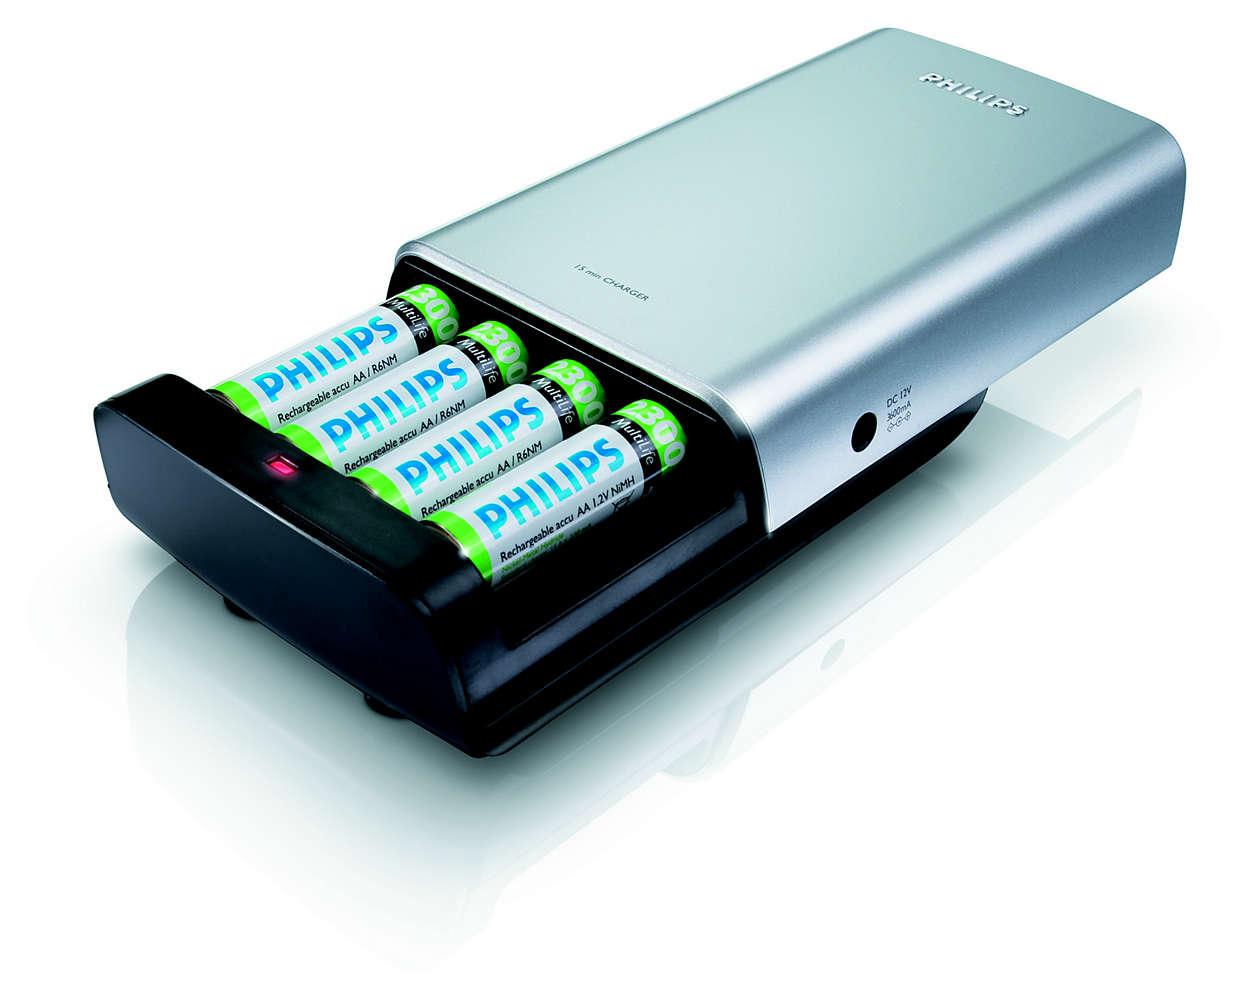 Plne nabije 1 až 2 batérie za 12 minút